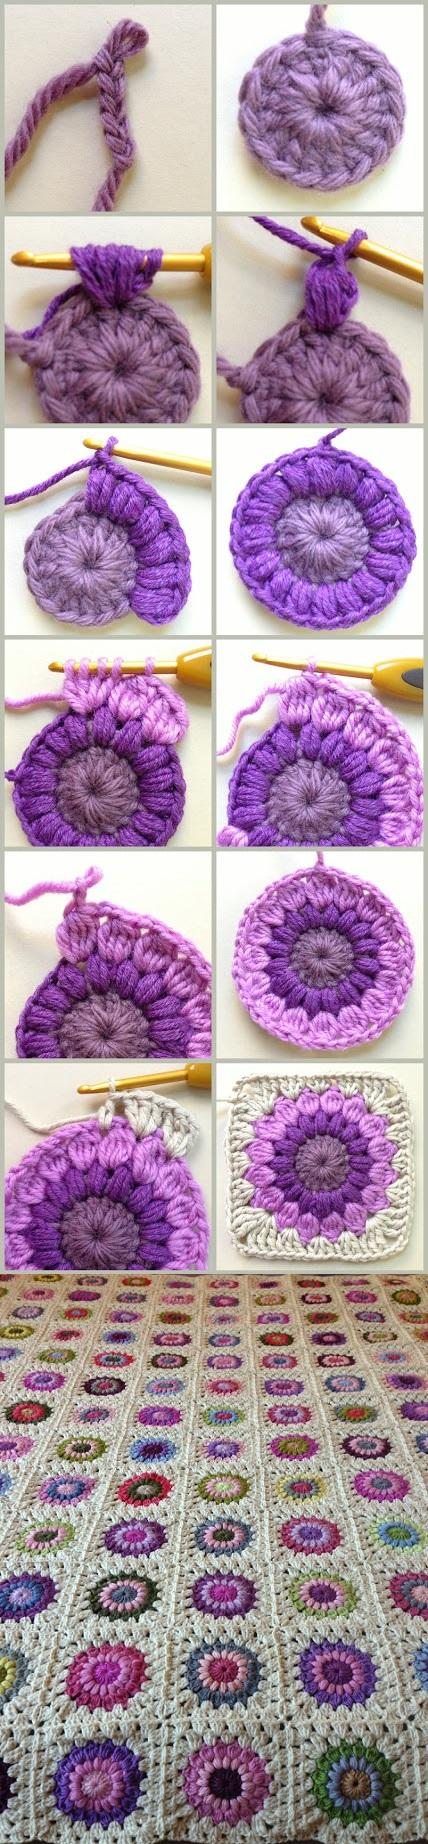 crochet-manualidades-1-http-www-manualidadesplus-com